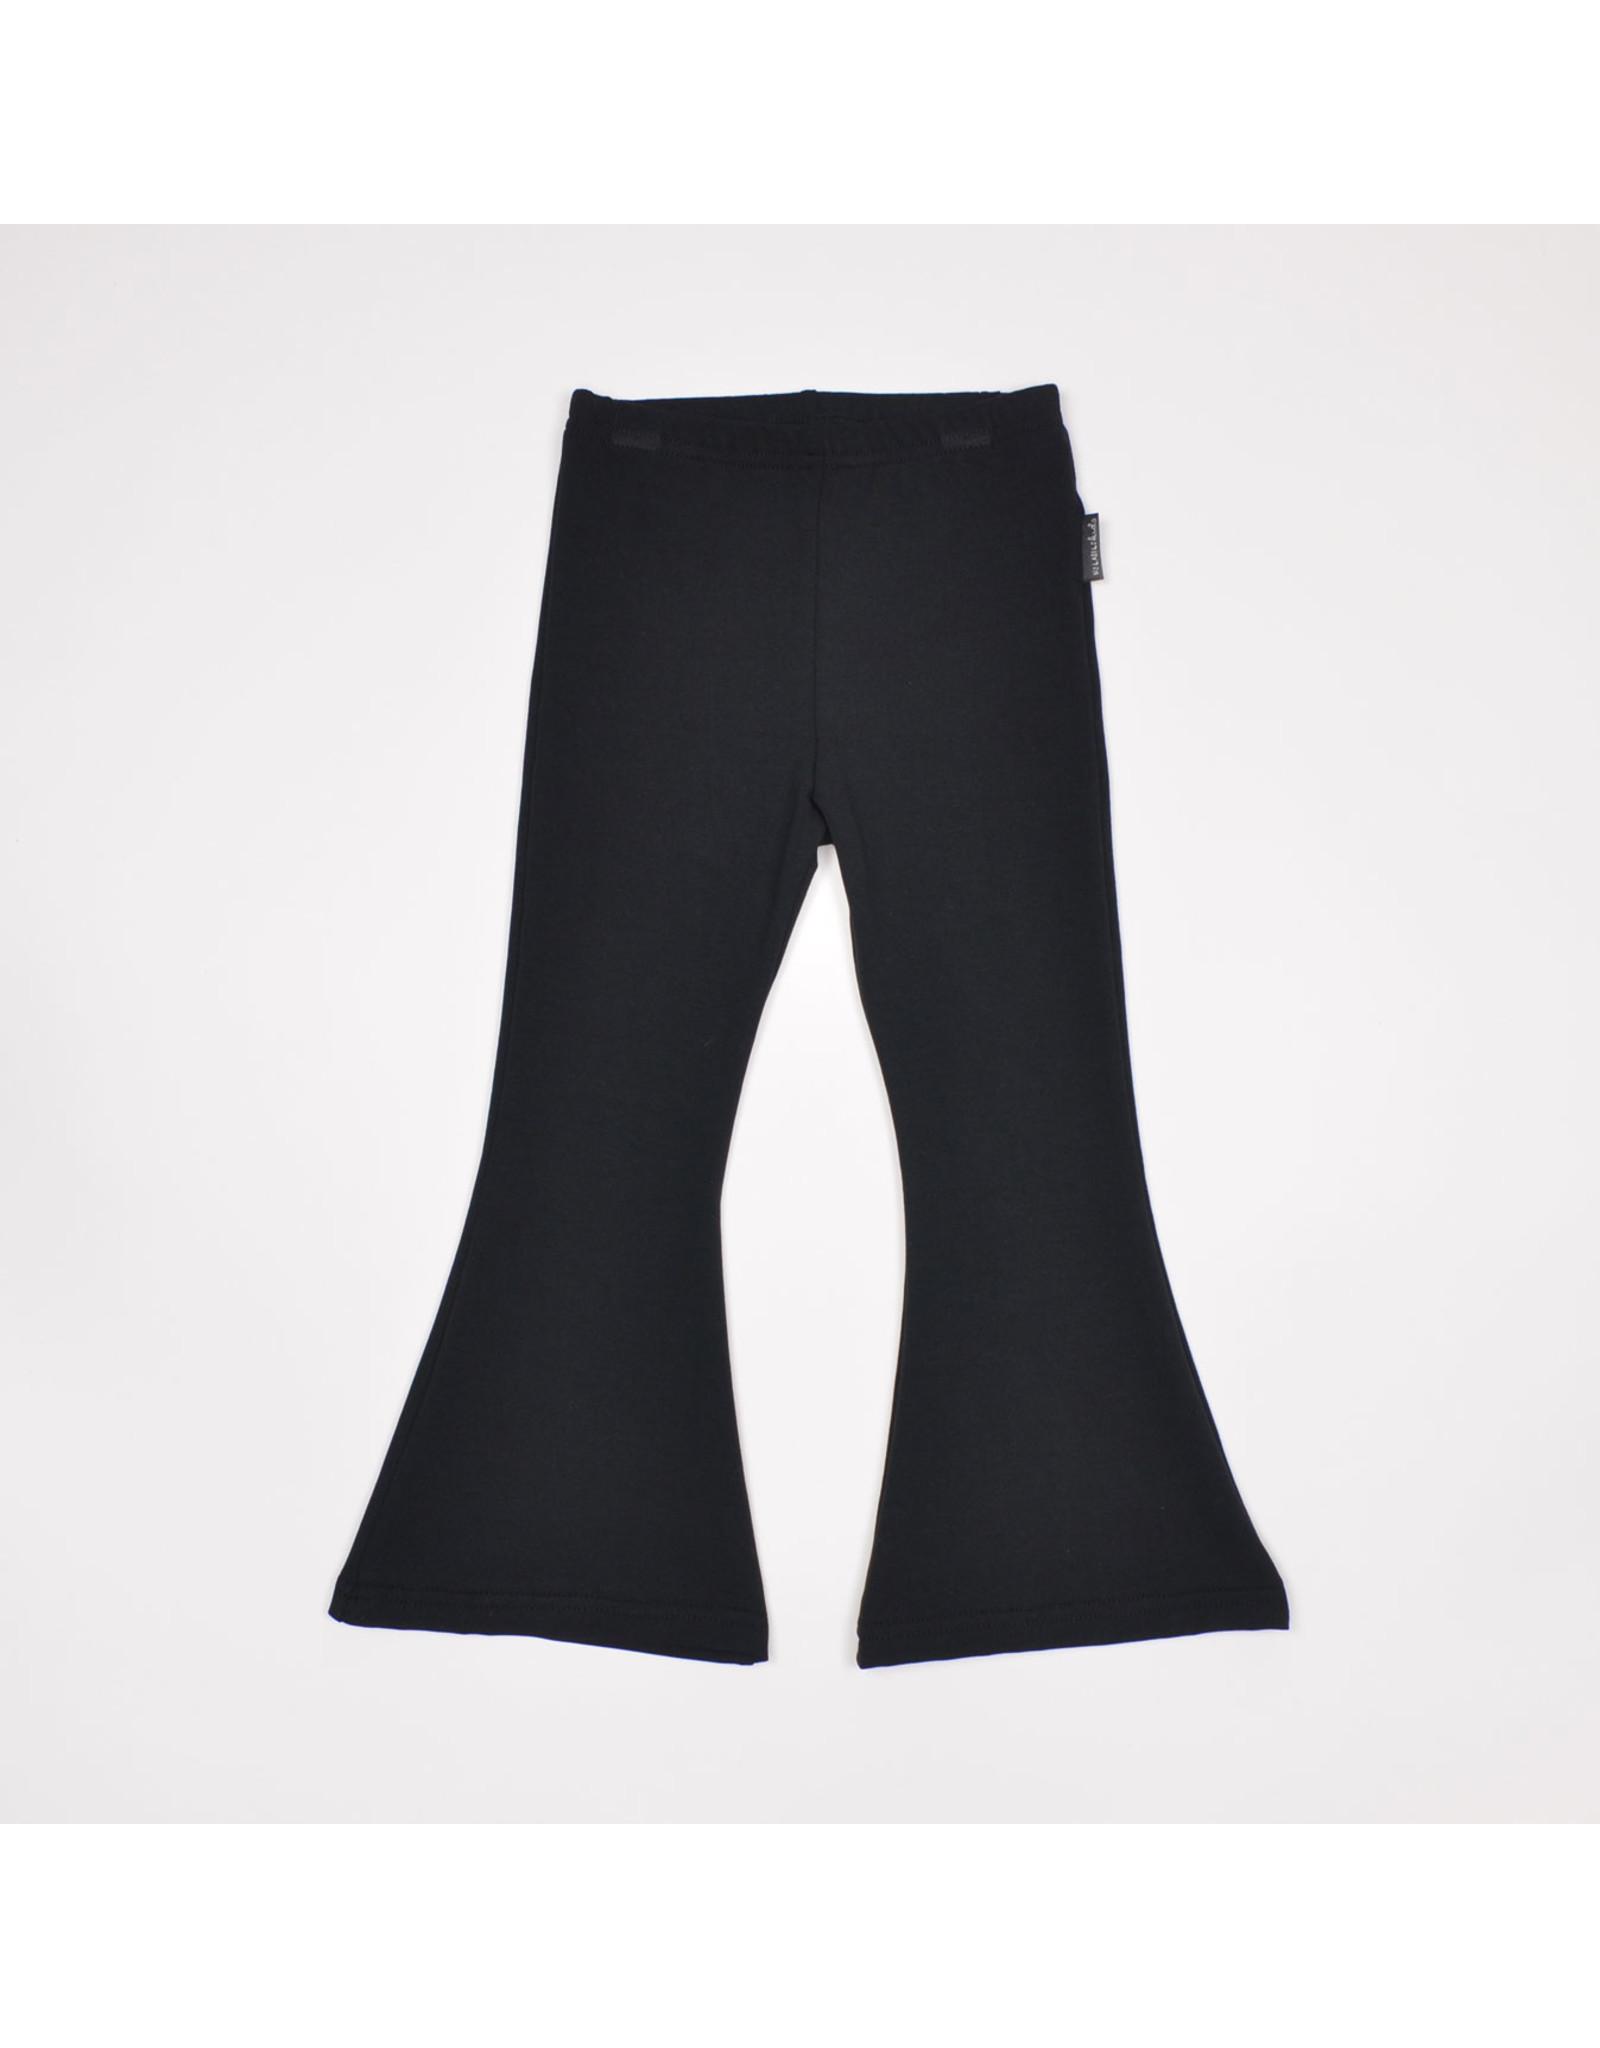 NL - Flare - Zwart